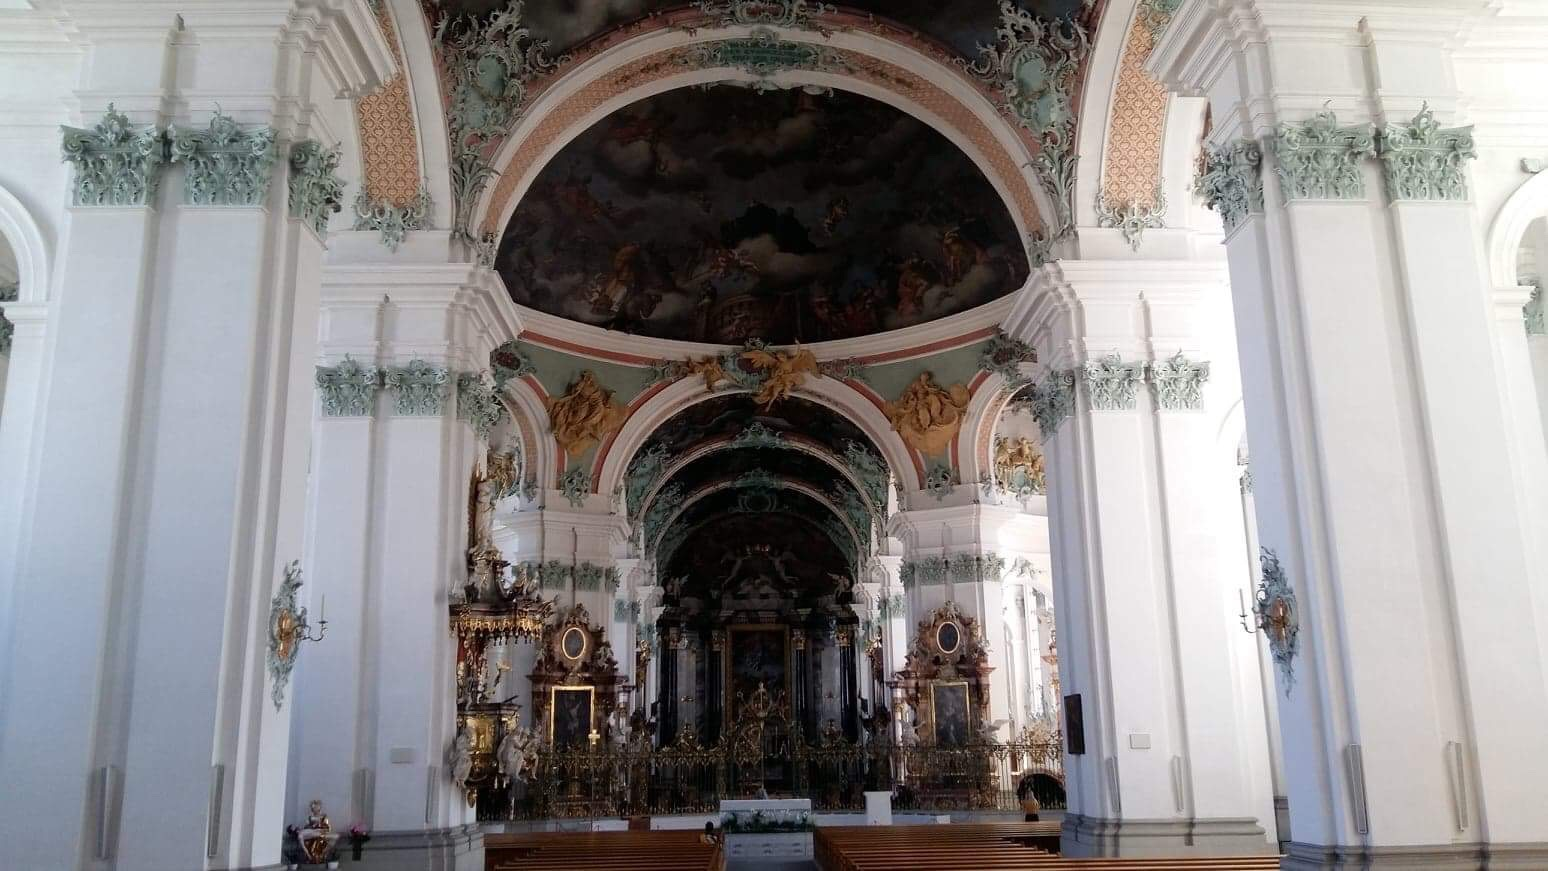 Abbey Saint Gallen